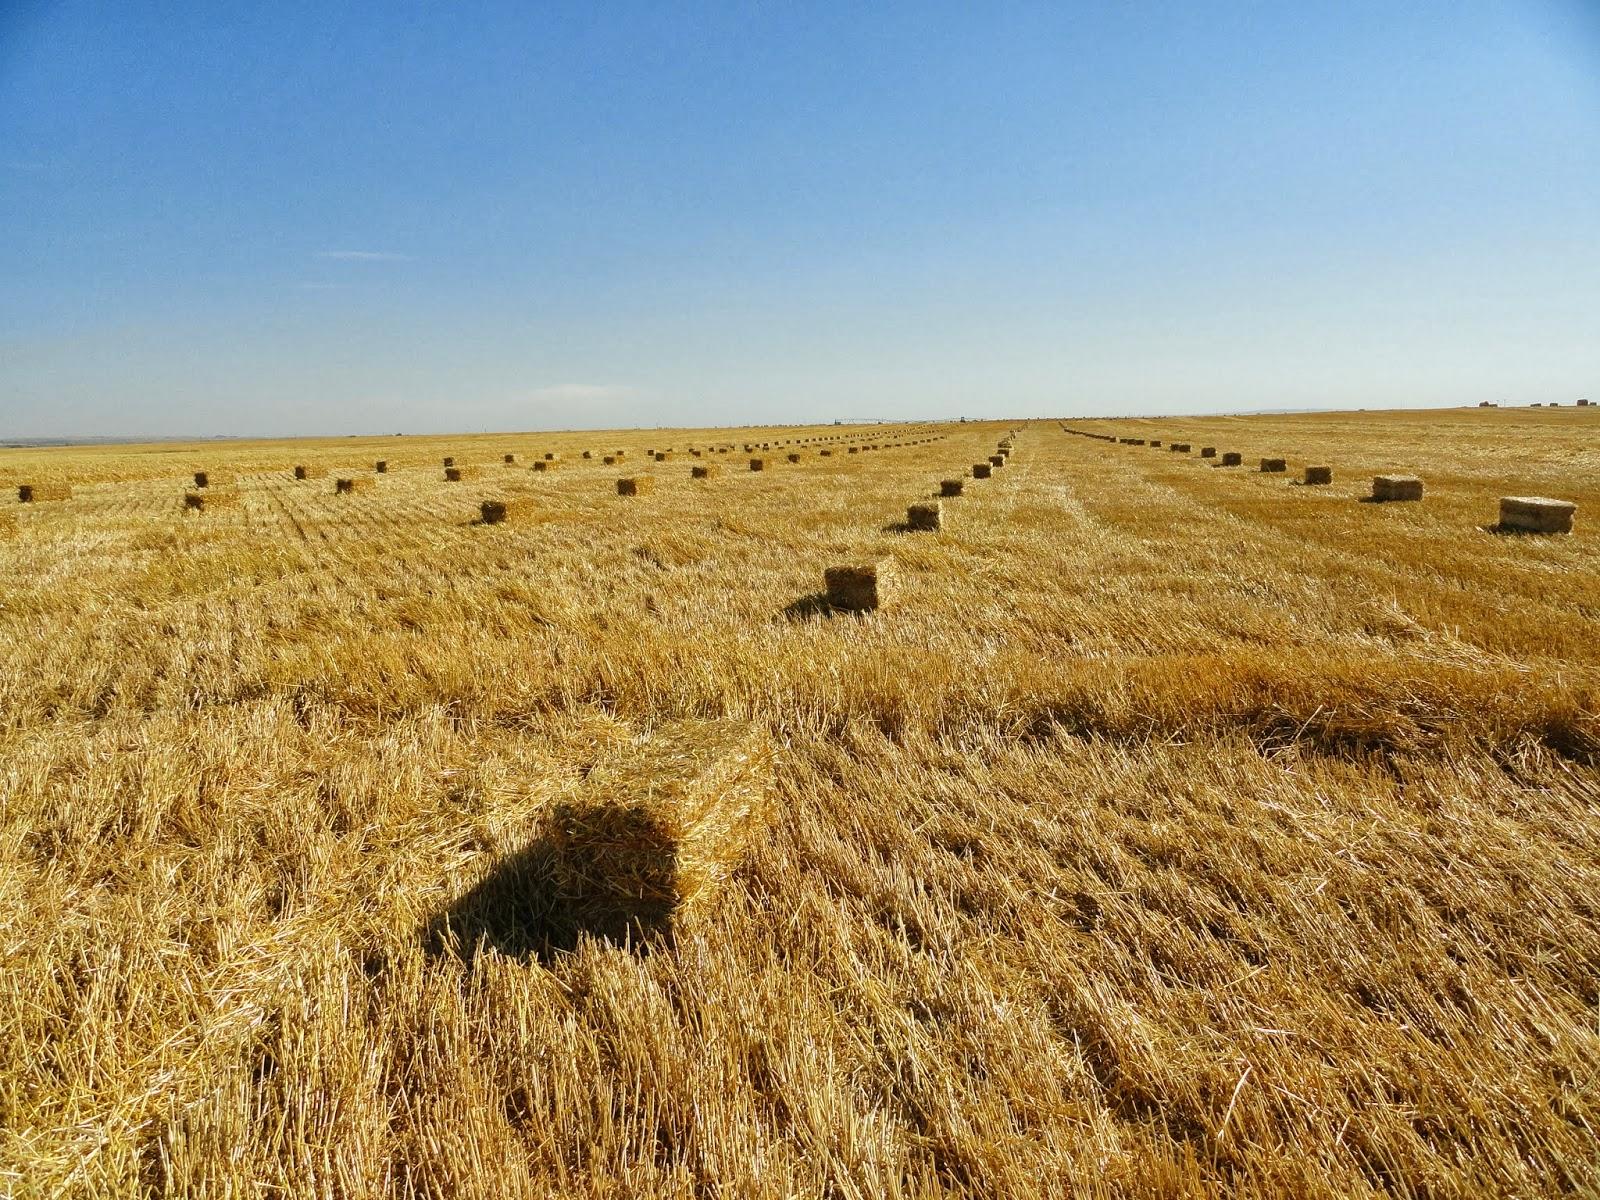 presse agricole moyenne densité